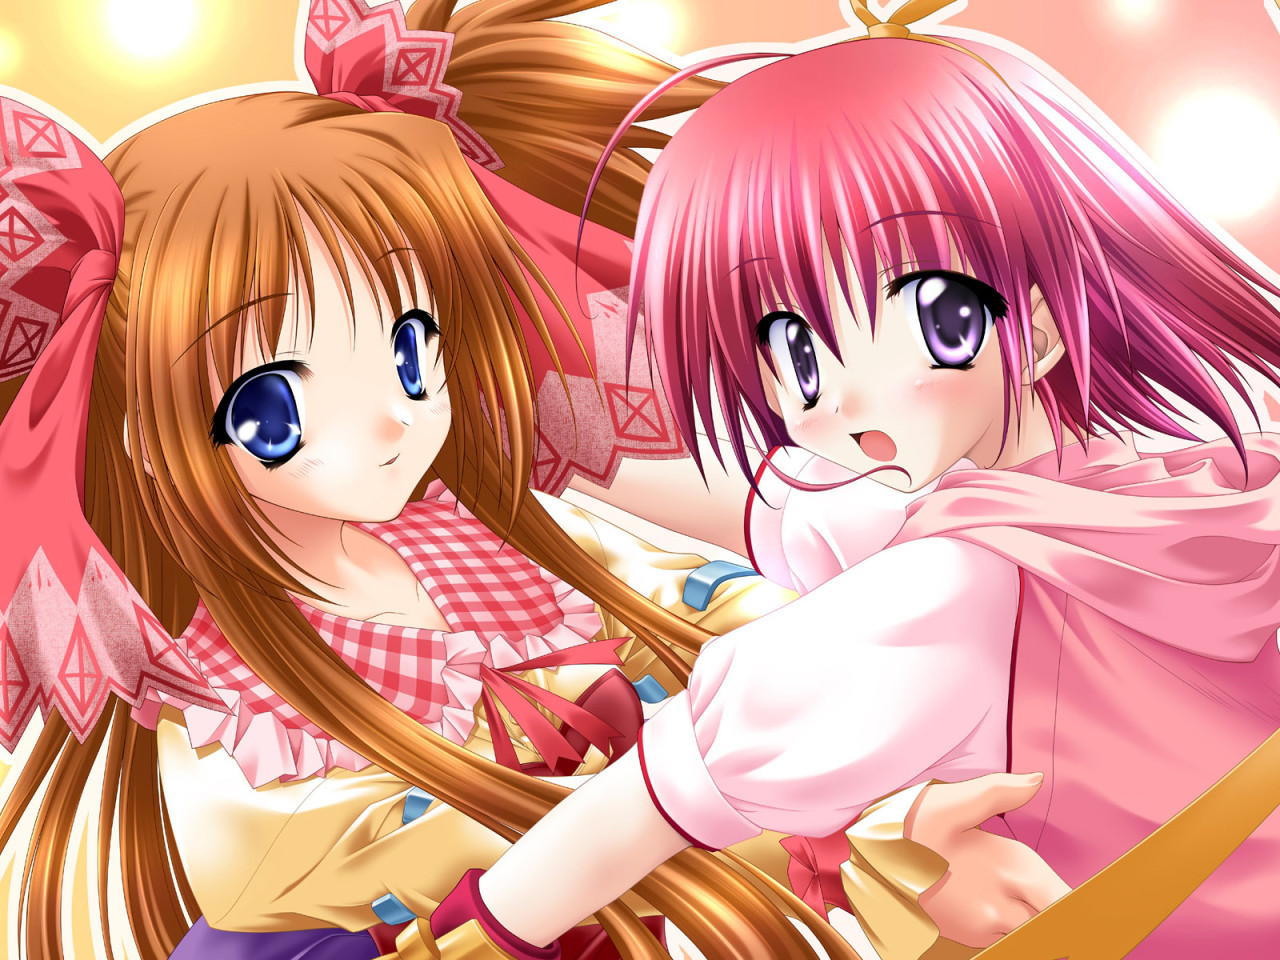 http://3.bp.blogspot.com/_3sU0MnRawMI/TVT_BWxThqI/AAAAAAAAFEg/Ftr1hzBFpfA/s1600/Anime-Girls%2B3.jpg